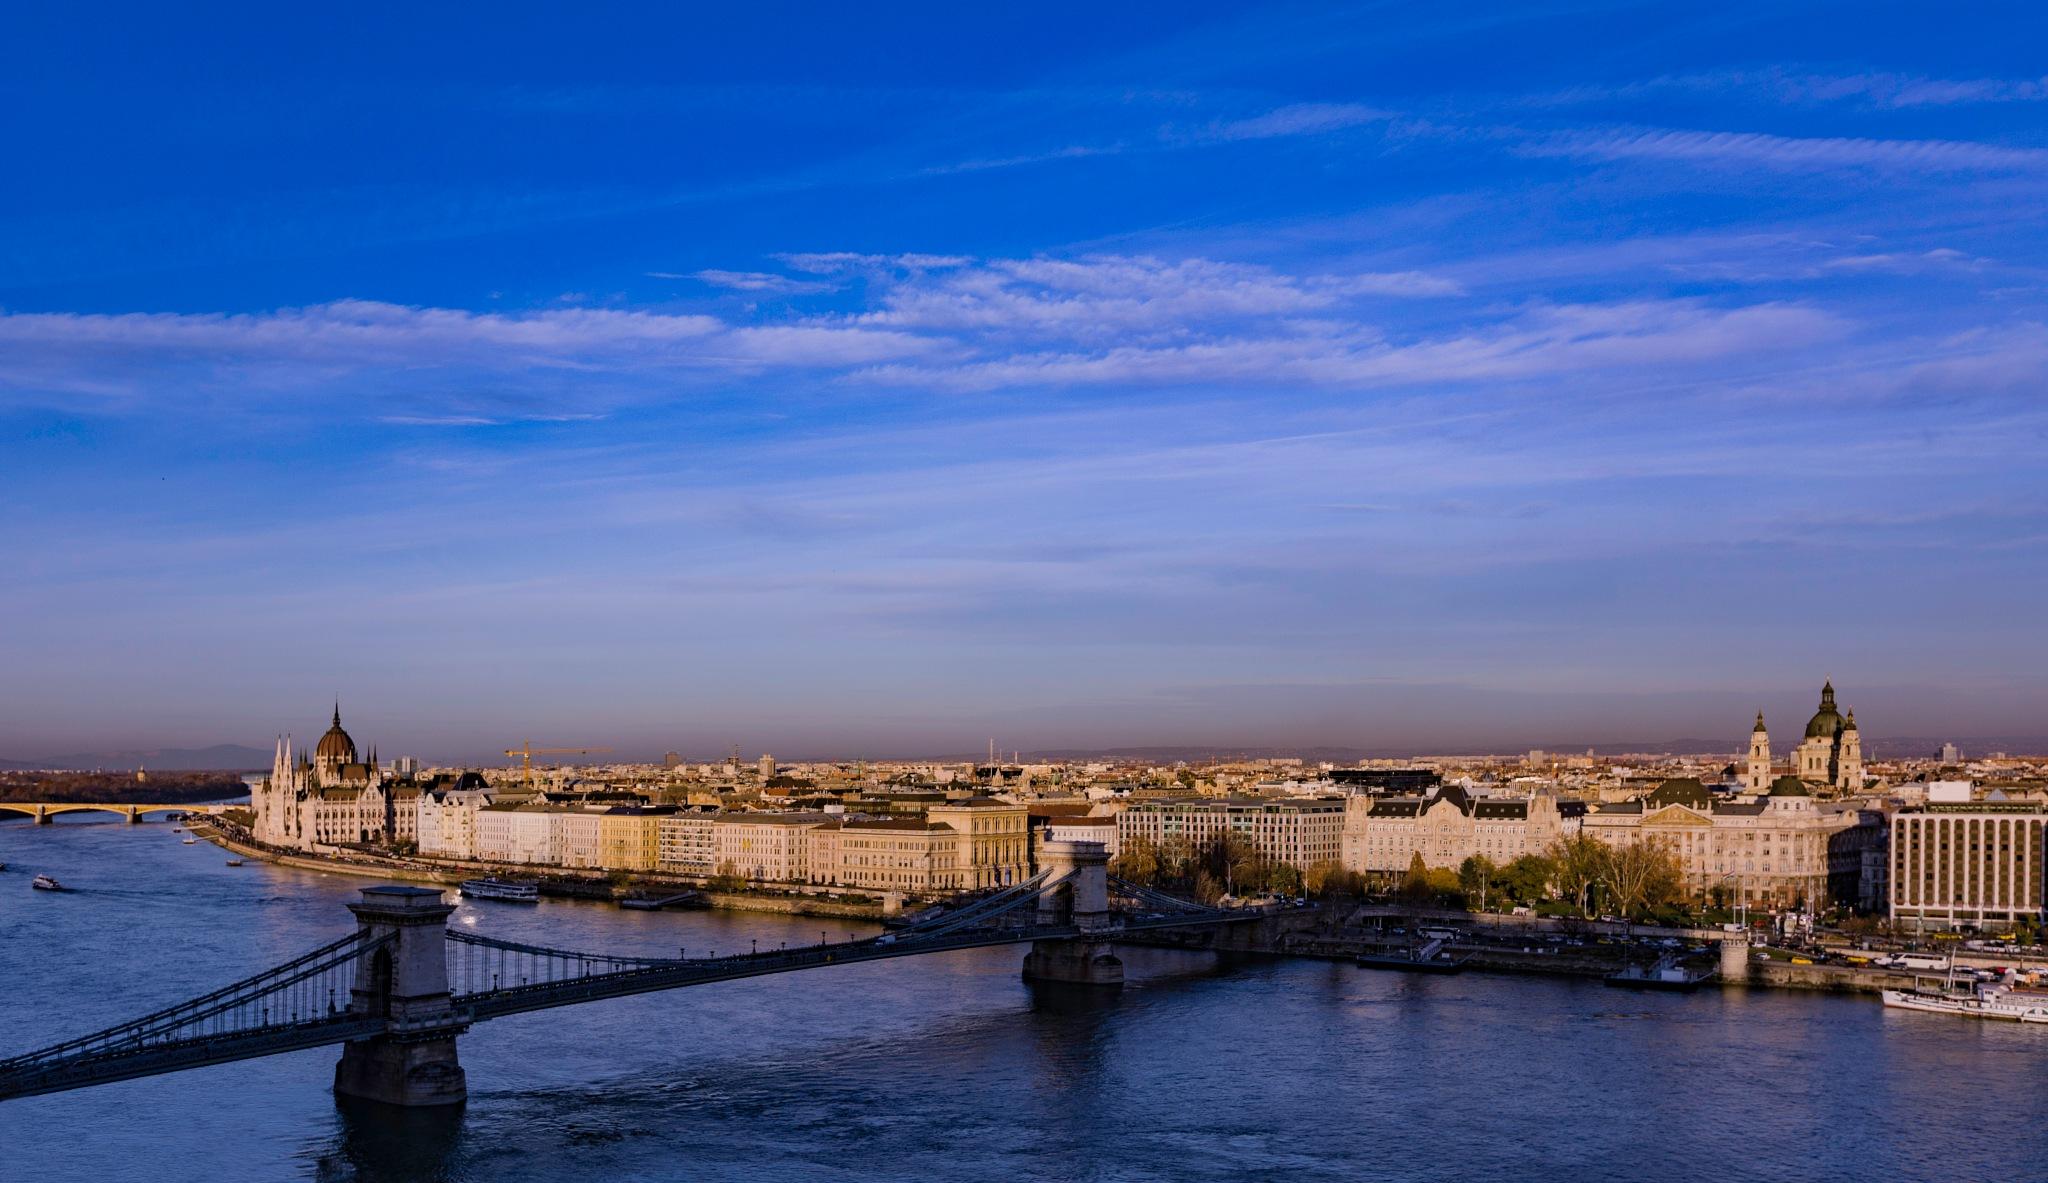 Winter Sky over Budapest by Maarit Komulainen